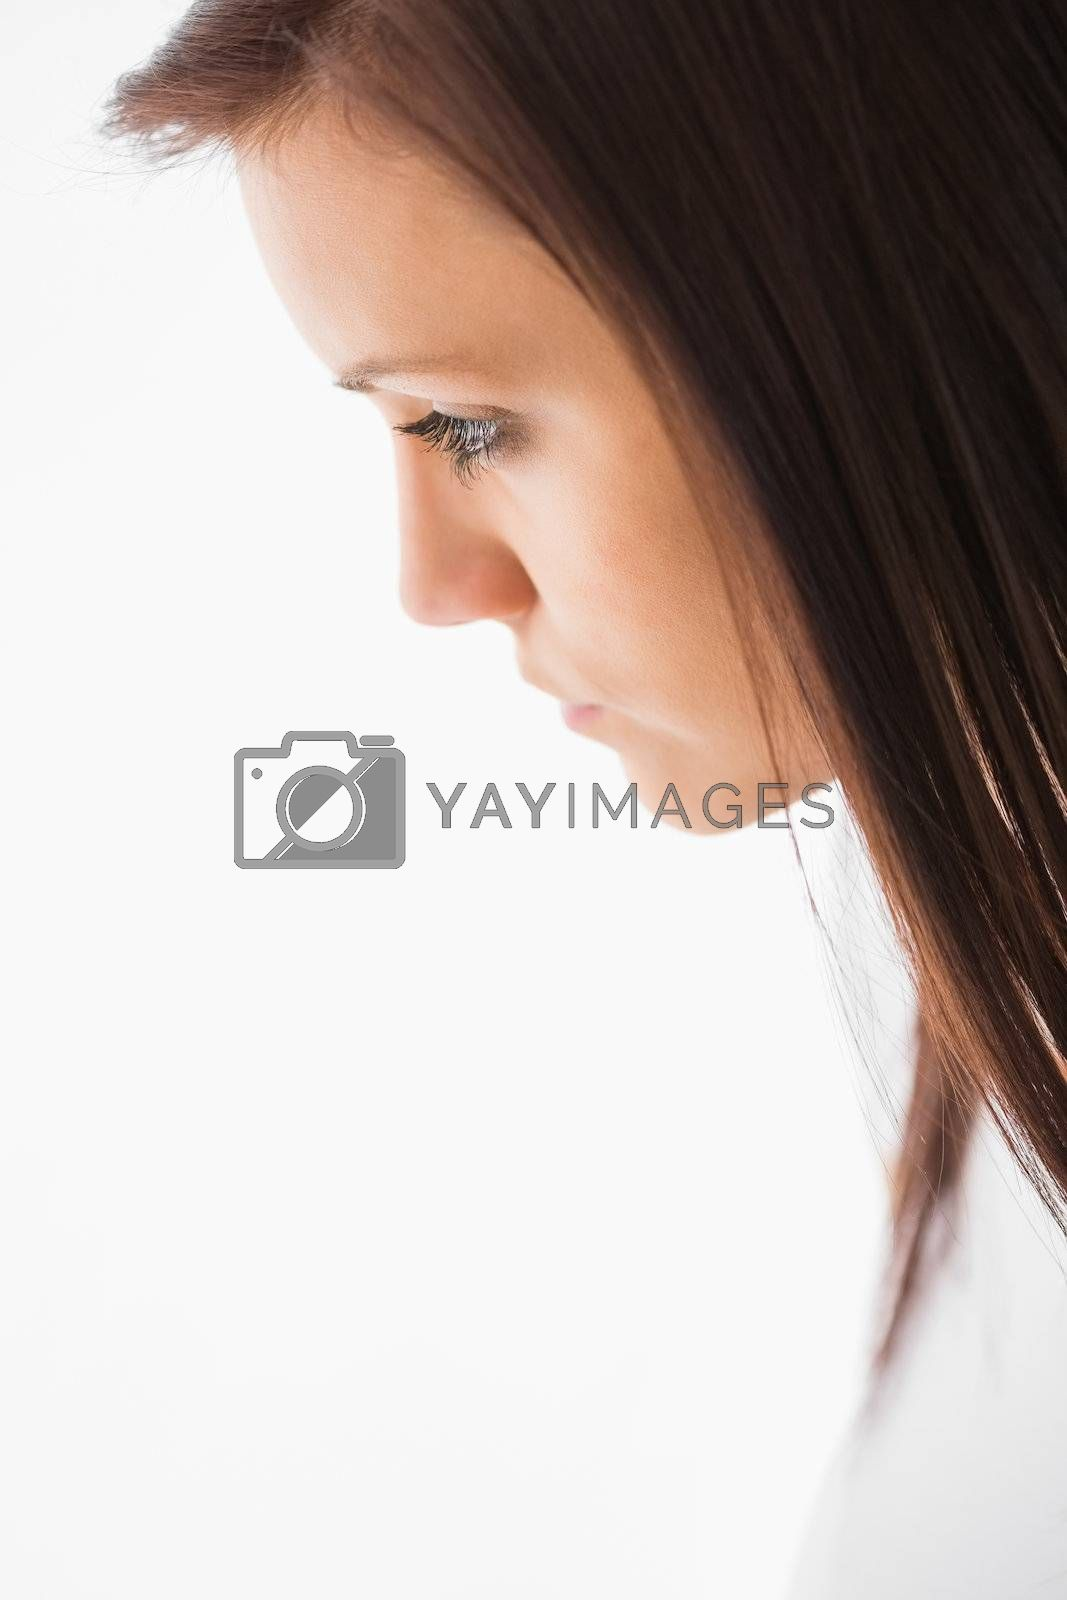 Thoughtful girl looking away by Wavebreakmedia